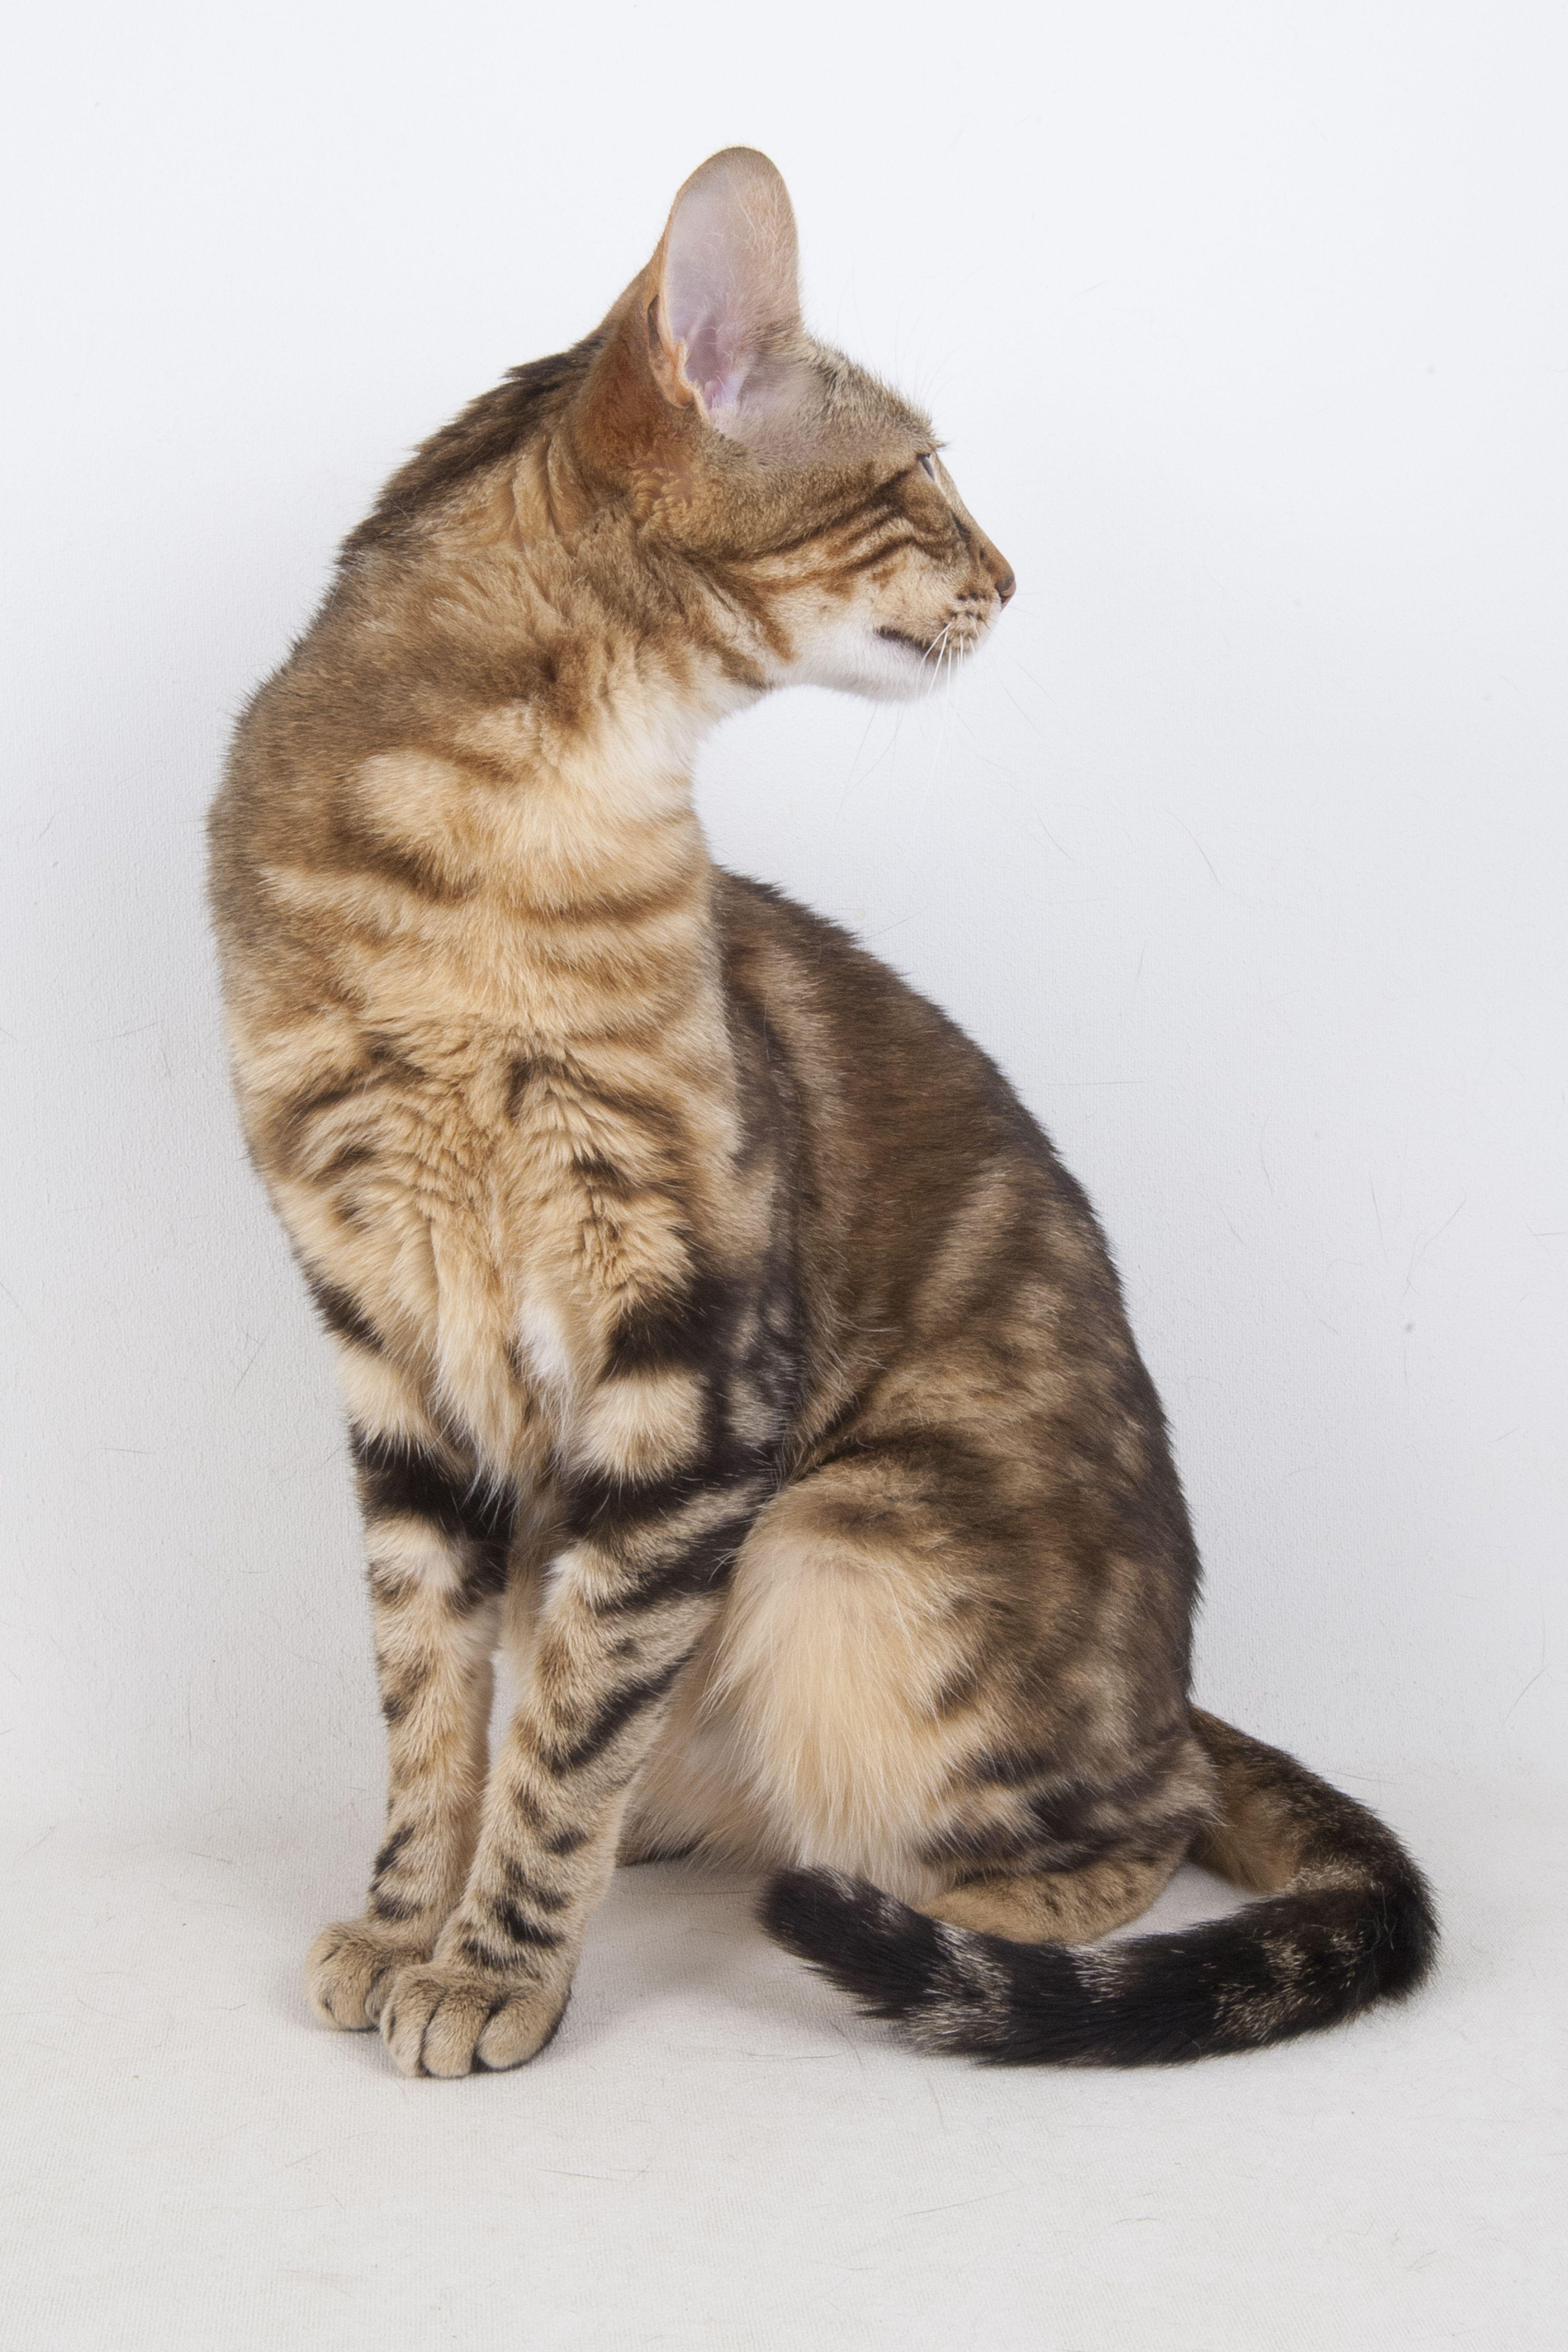 Stylisticat produced F1 Savannah Kitten Stylisticat